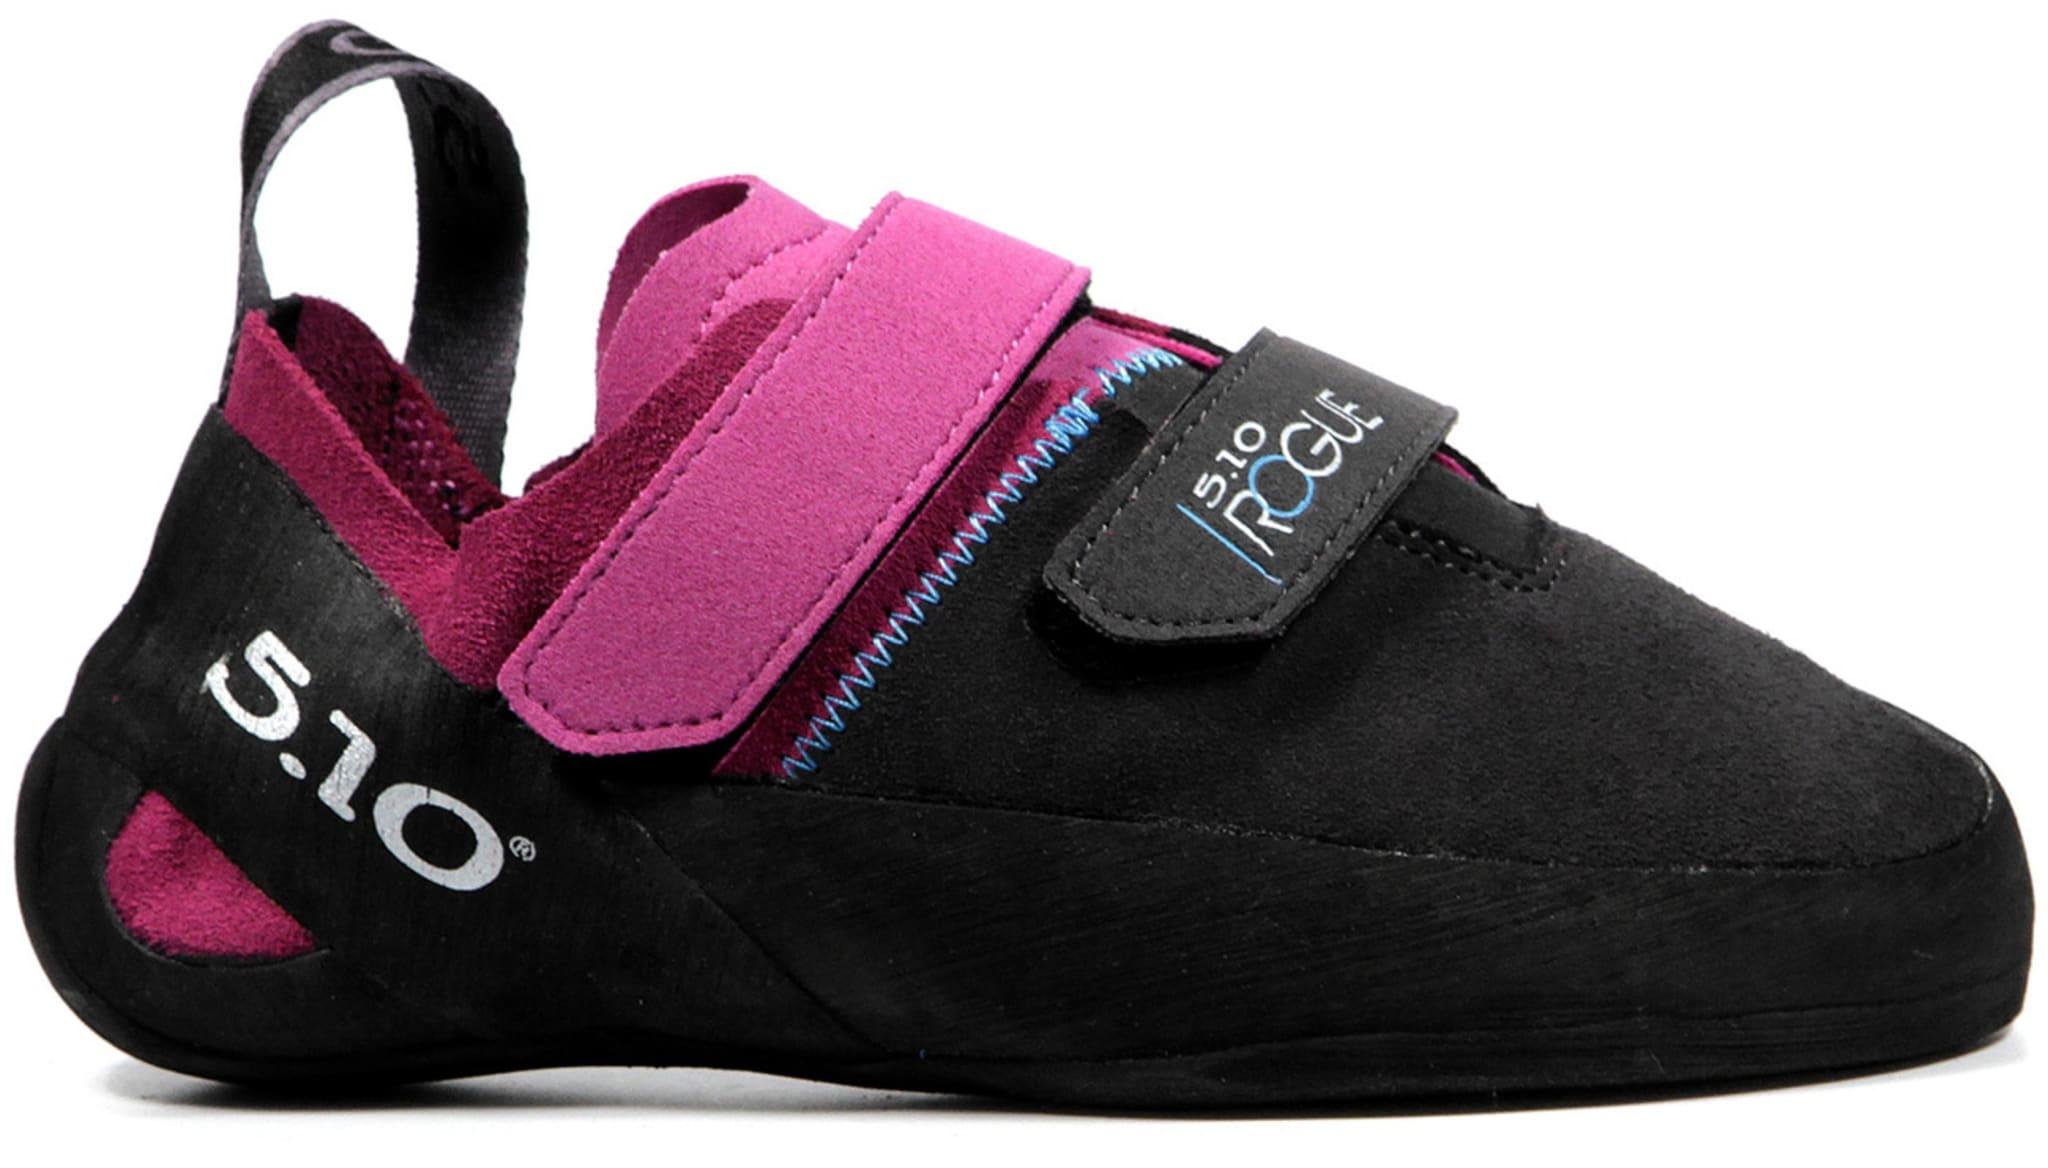 Komfortabel sko for nybegynnere og for klatring på lange ruter!